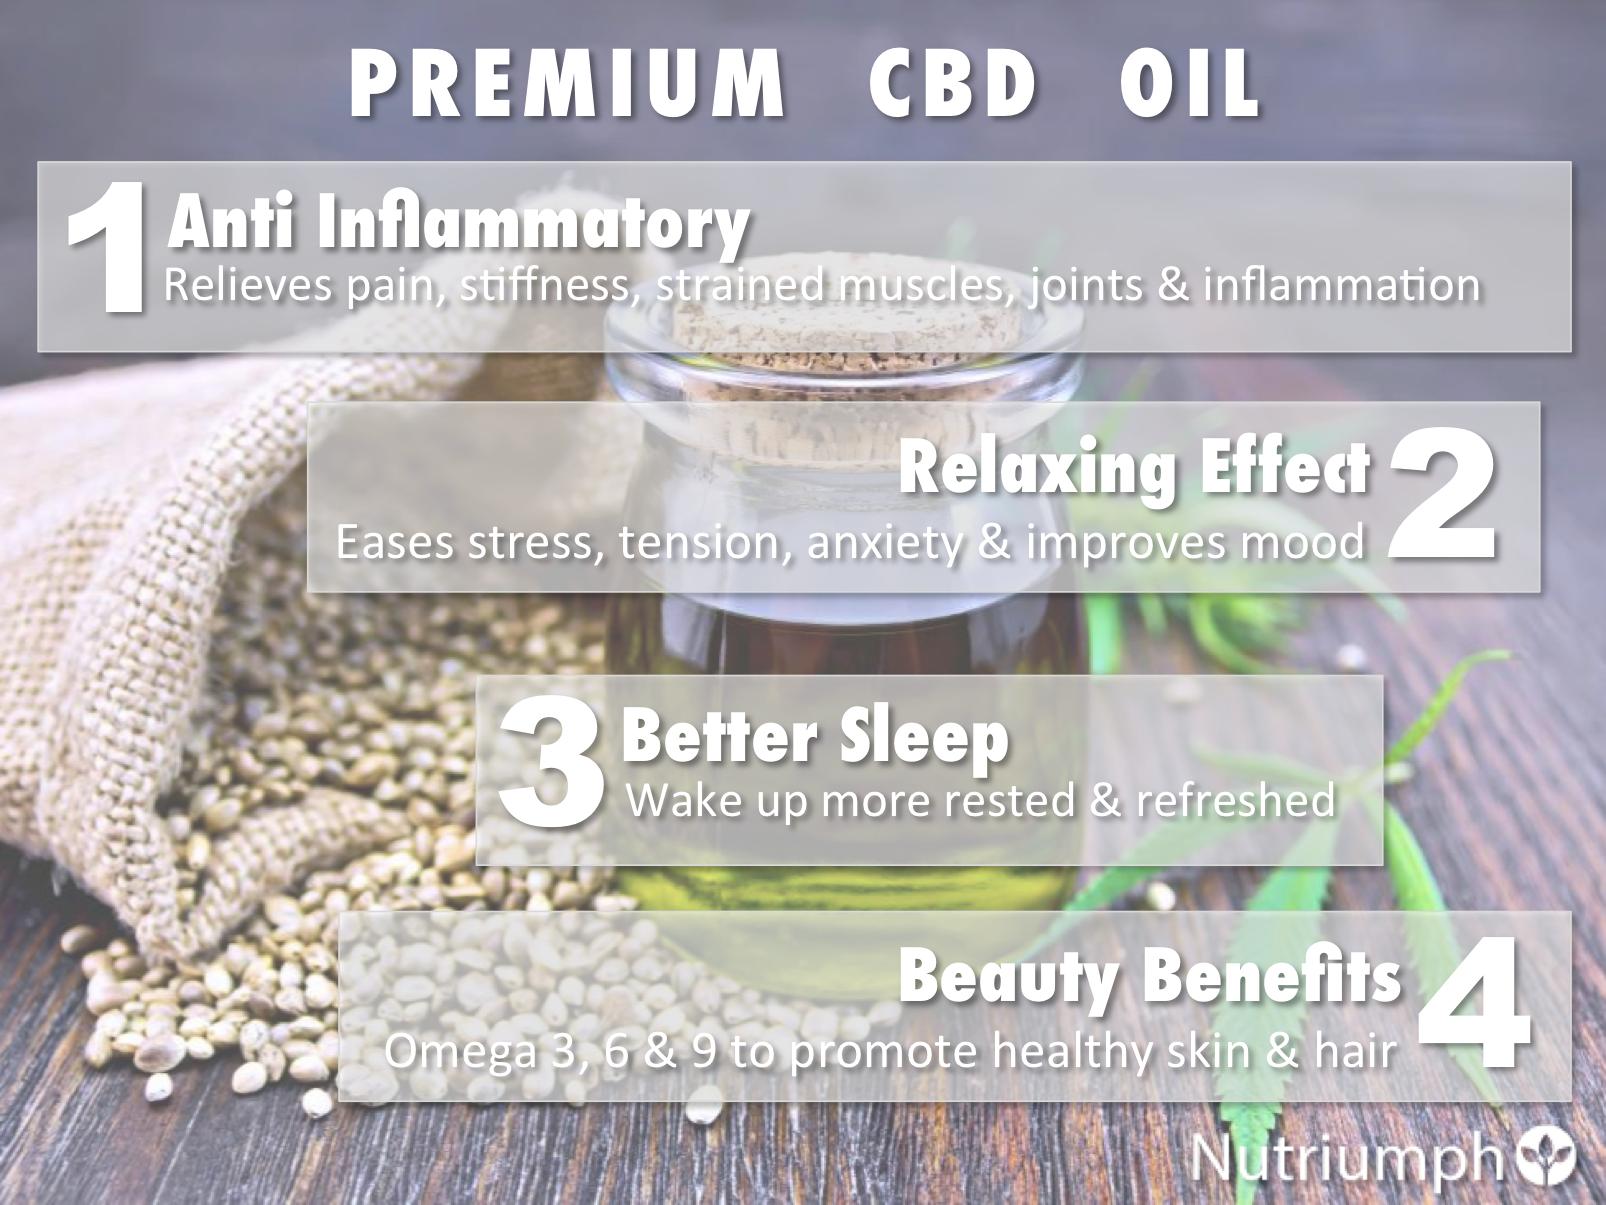 Nutriumph pure natural hemp oil 1000mg full spectrum premium cbd drops